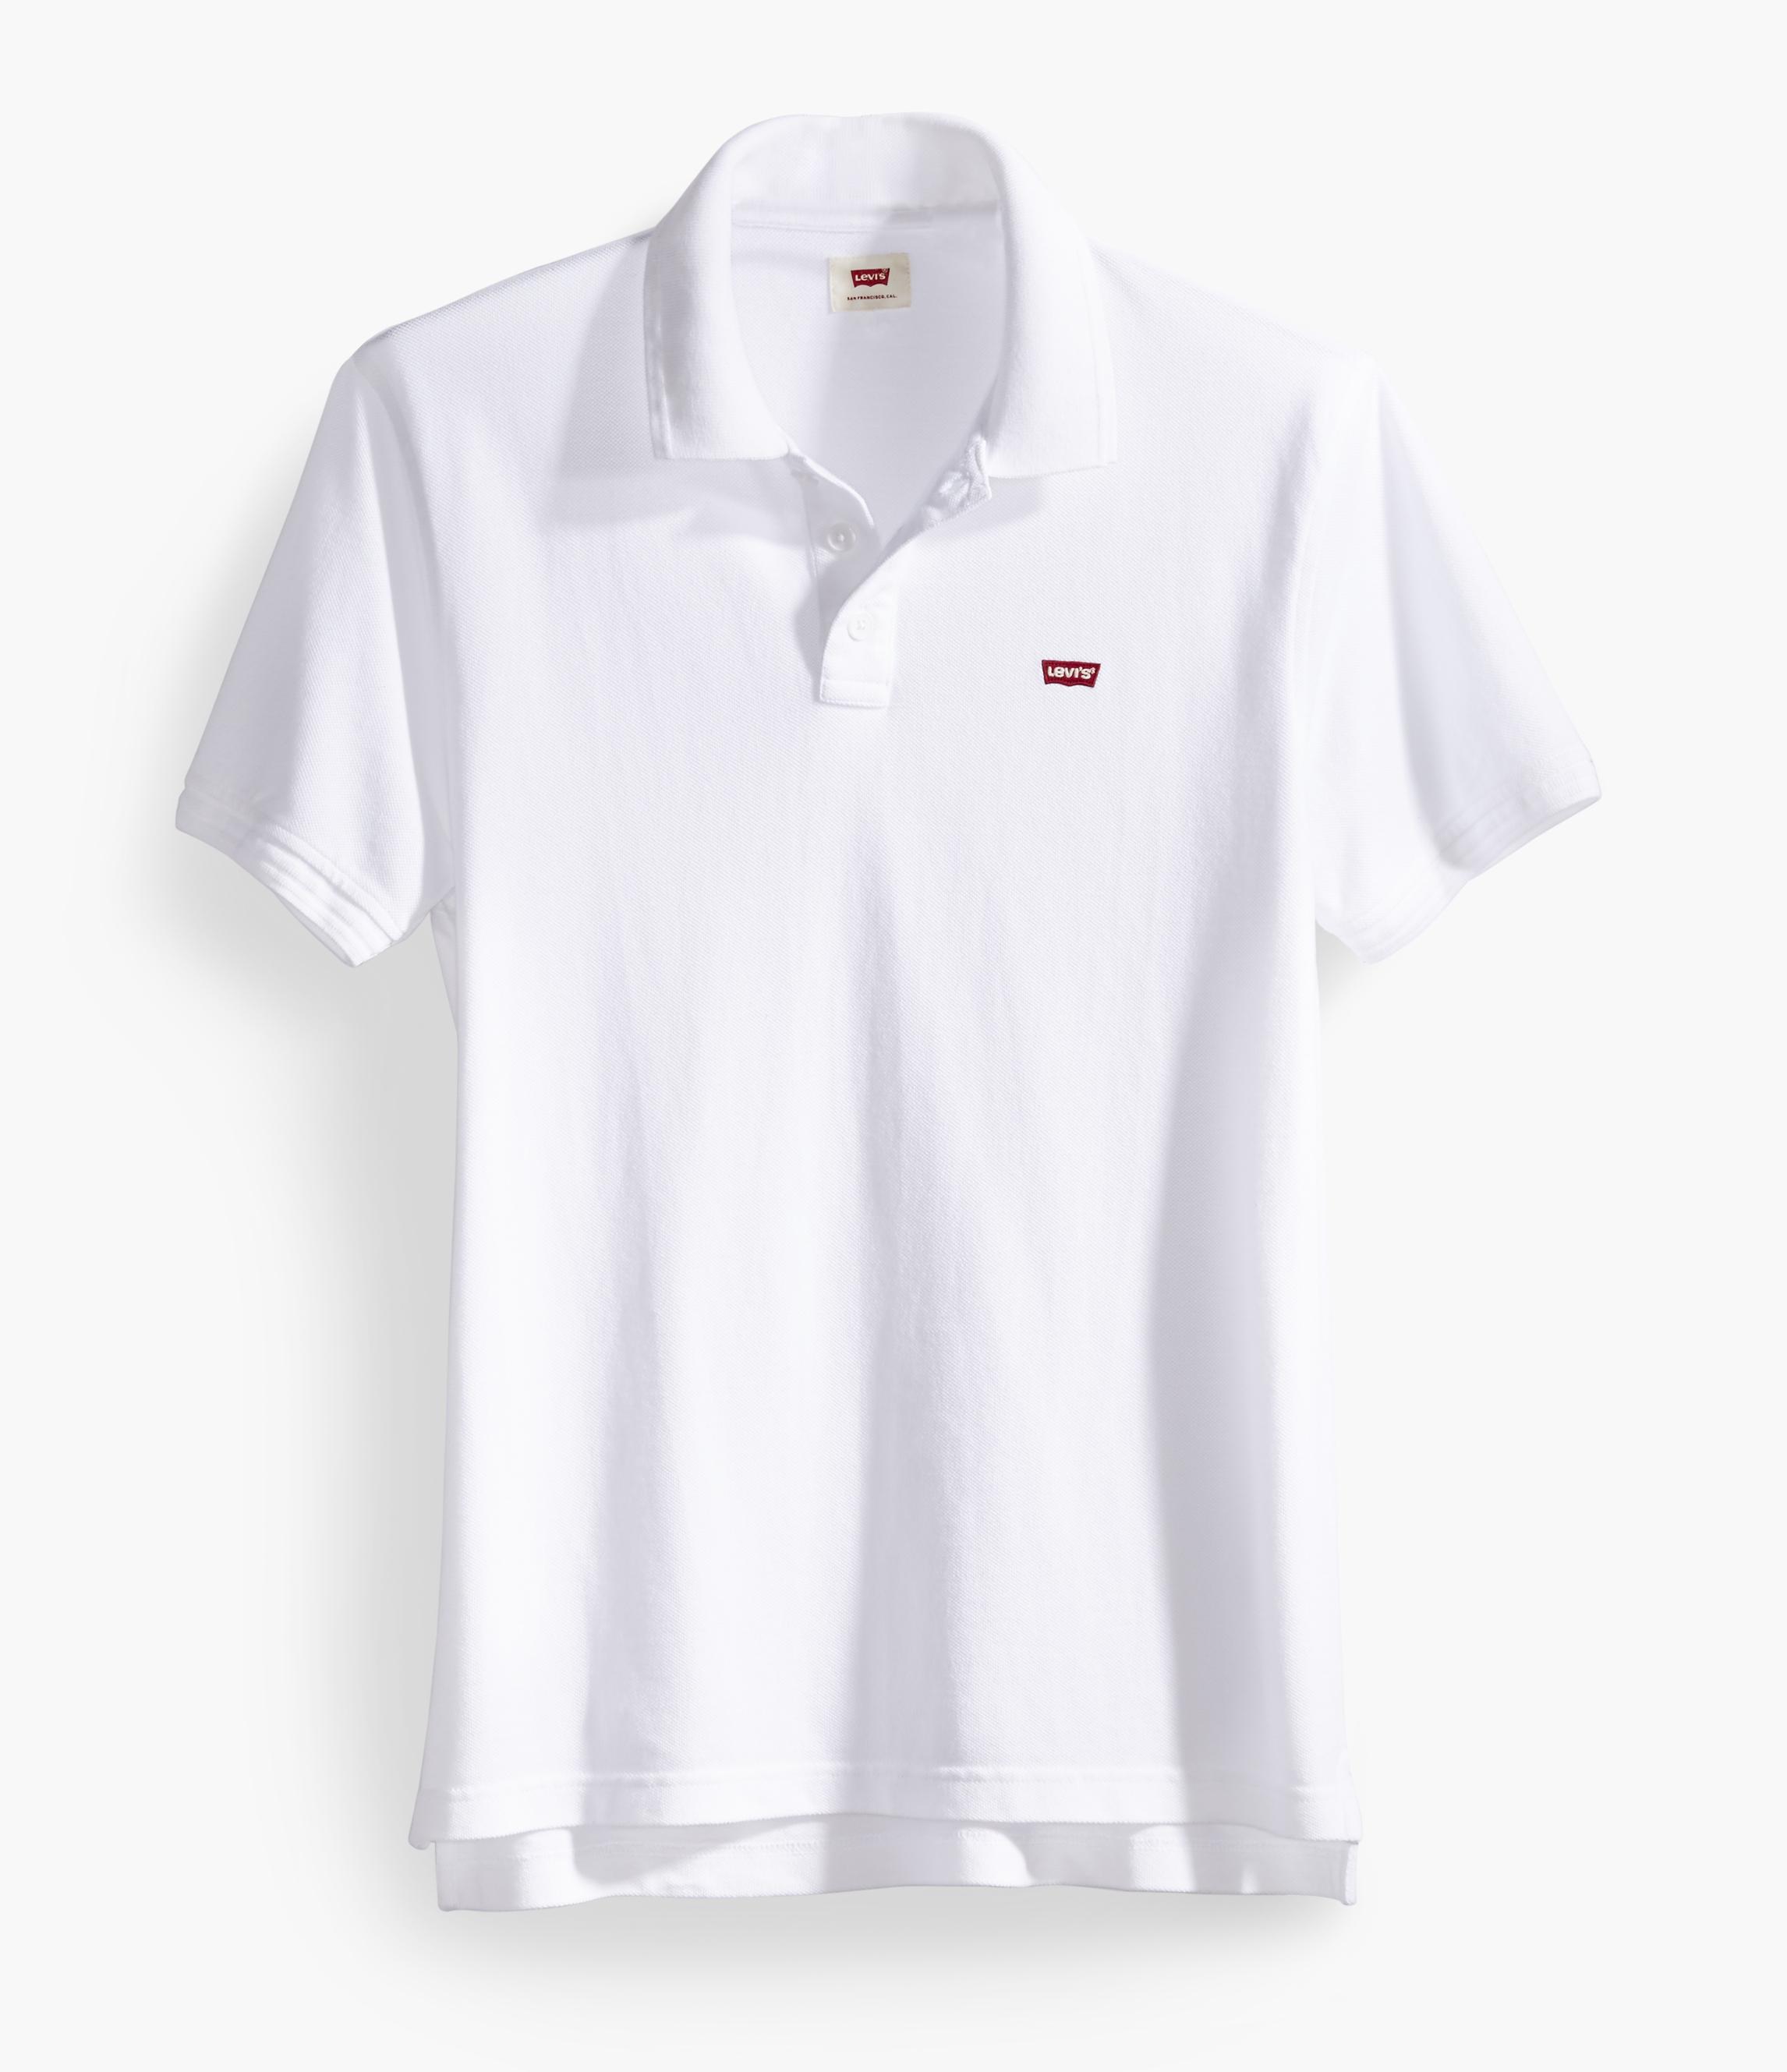 LEVIS Shirt Kurzarm Poloshirt 22401-0001 weiß W18-LVPS1